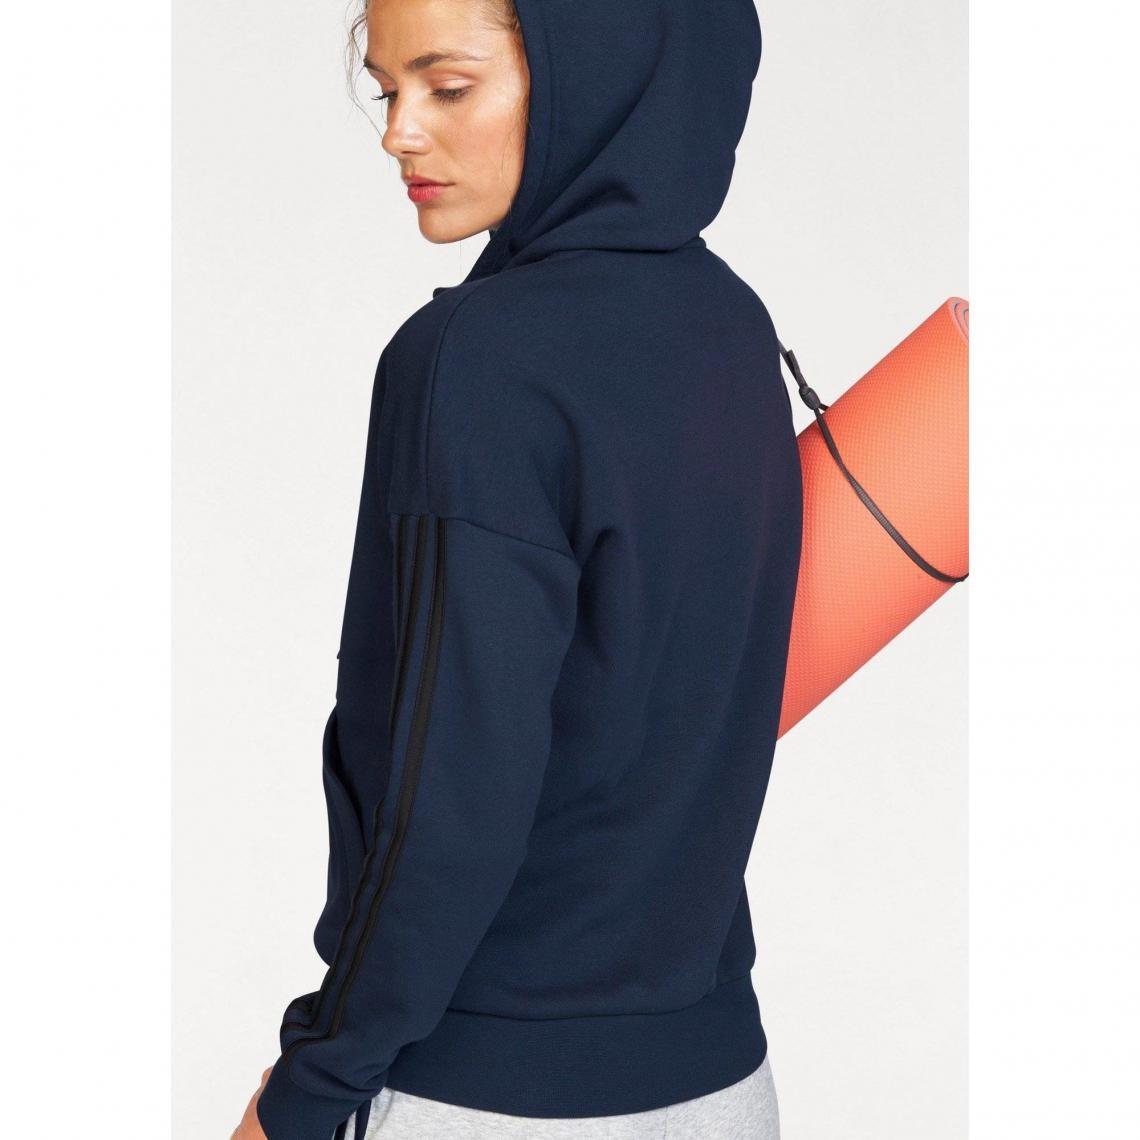 acda1f5e6b62 Sweat-shirt capuche femme Essentials 3 Stripes Fullzip Hoodie adidas ...